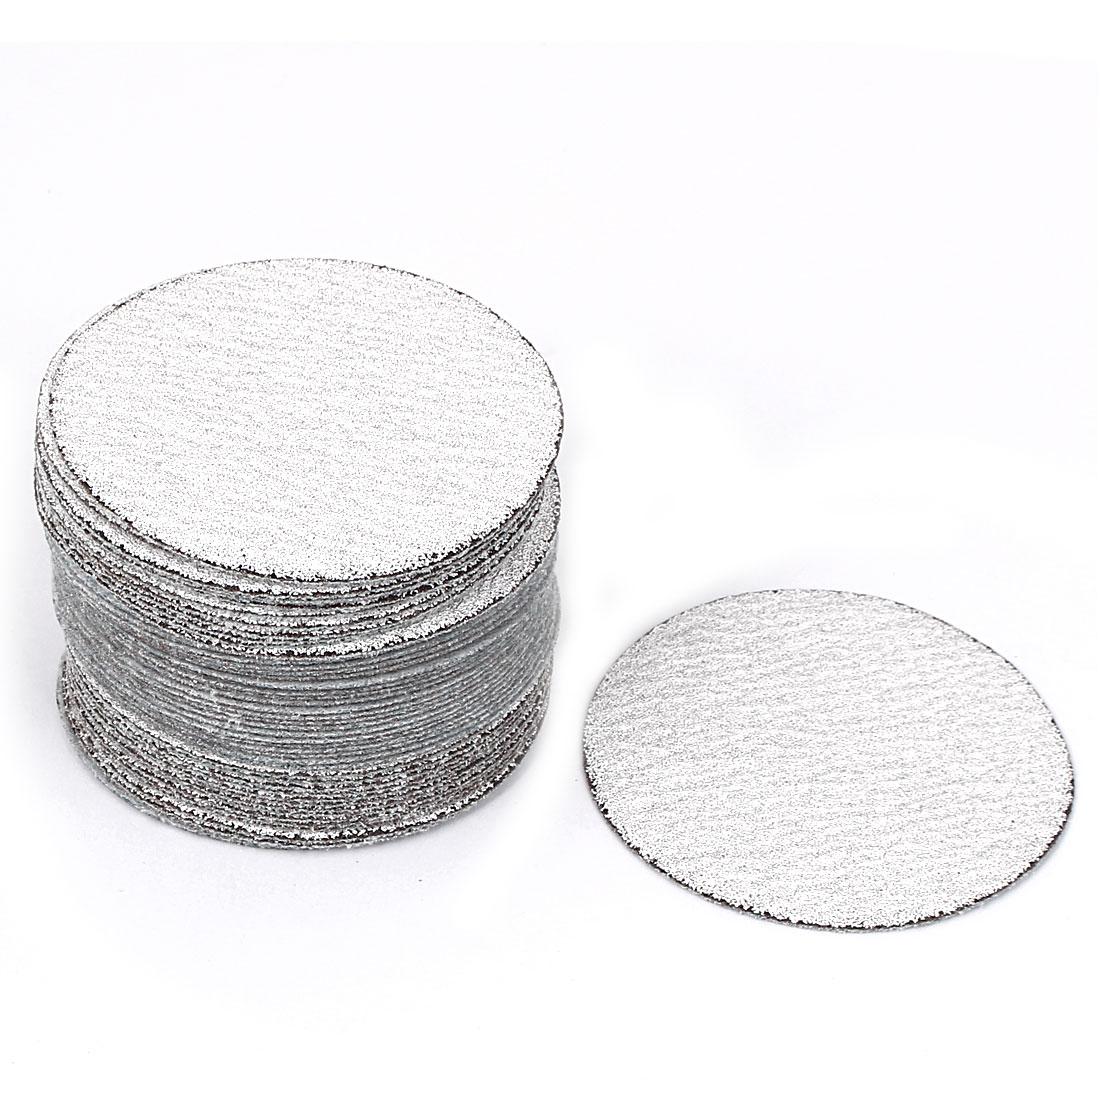 "3"" Dia Polishing Round Dry Abrasive Sanding Sandpaper Sheet Disc 120 Grit 50pcs"